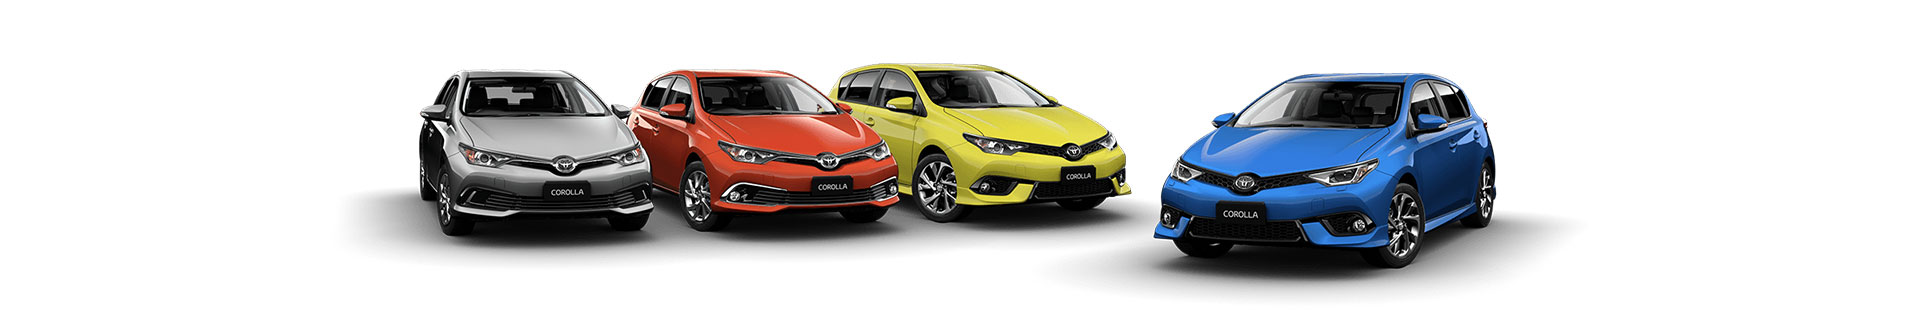 Car Dealer in VIC Wangaratta 3677 Wangaratta Toyota 29 Tone Road 0357222000